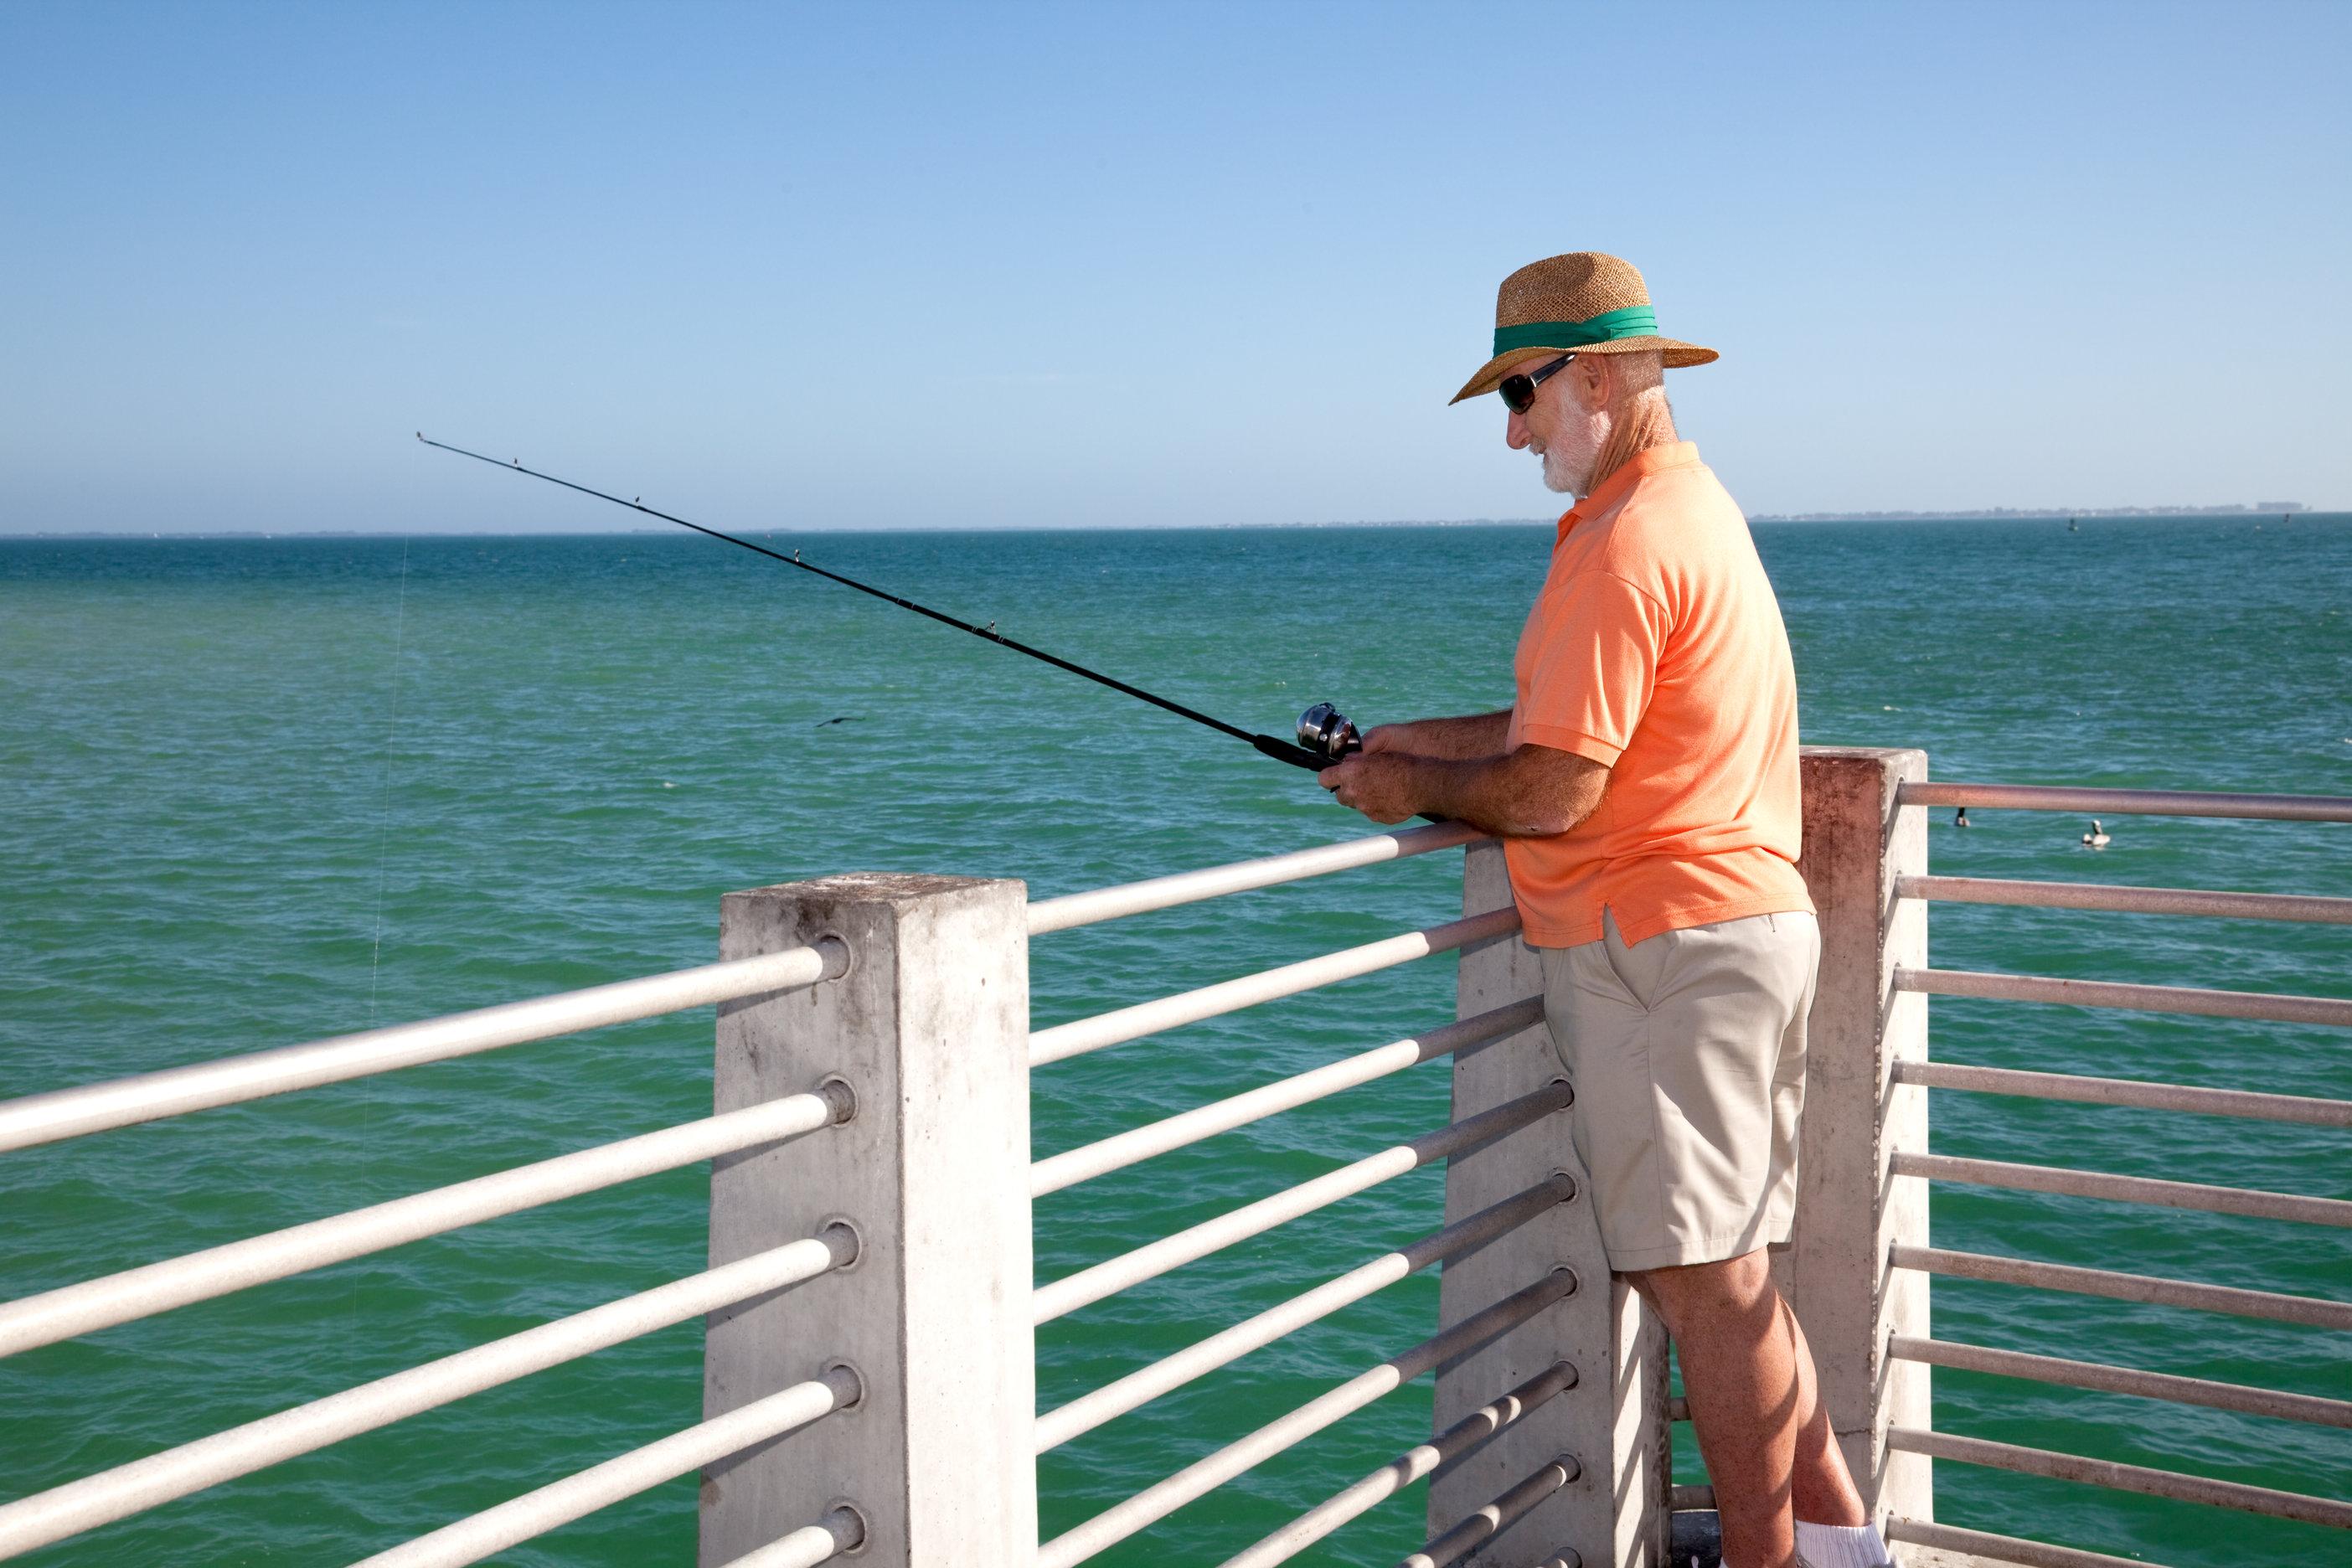 senior angler fishing from a pier